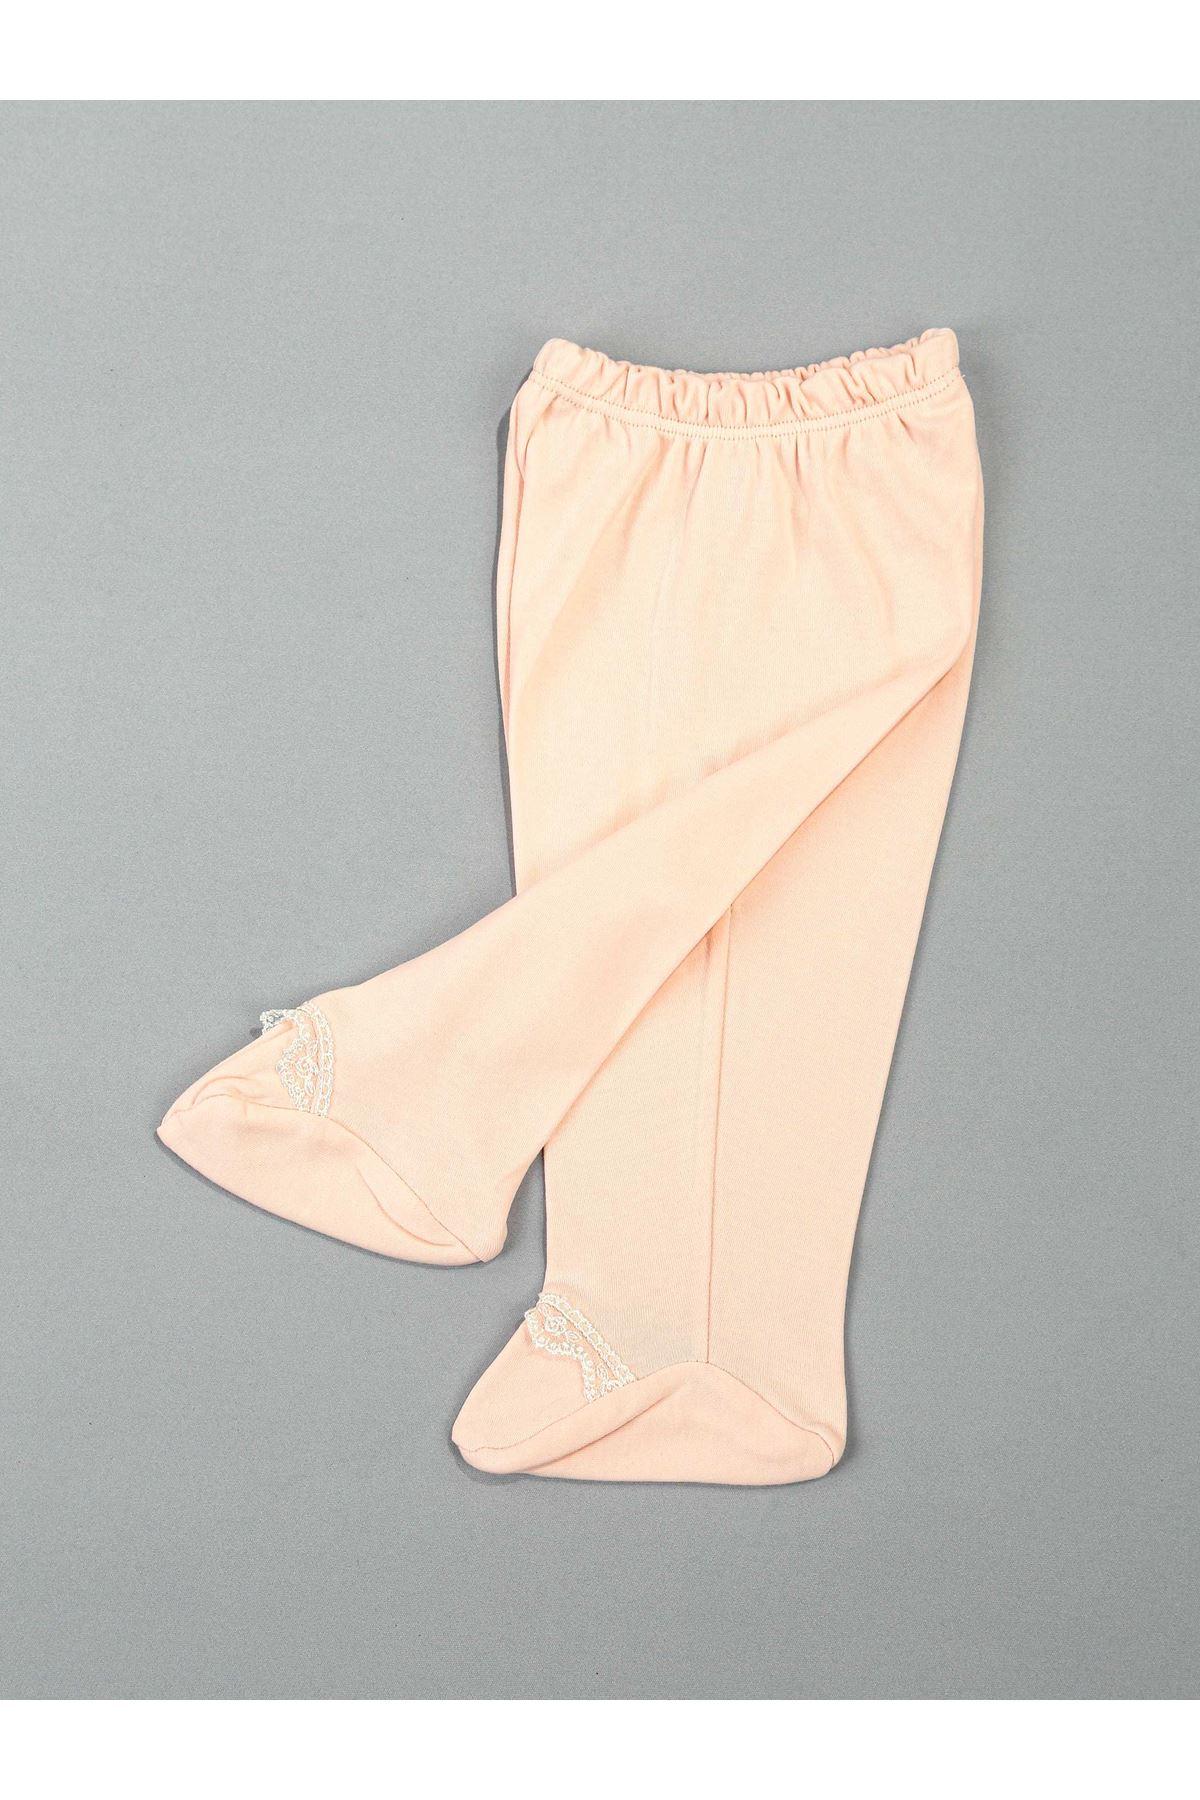 Powder Baby Girl Newborn 10 Piece Suit Hospital Wear Cotton Casual Girls Babies Sets Seasonal Models